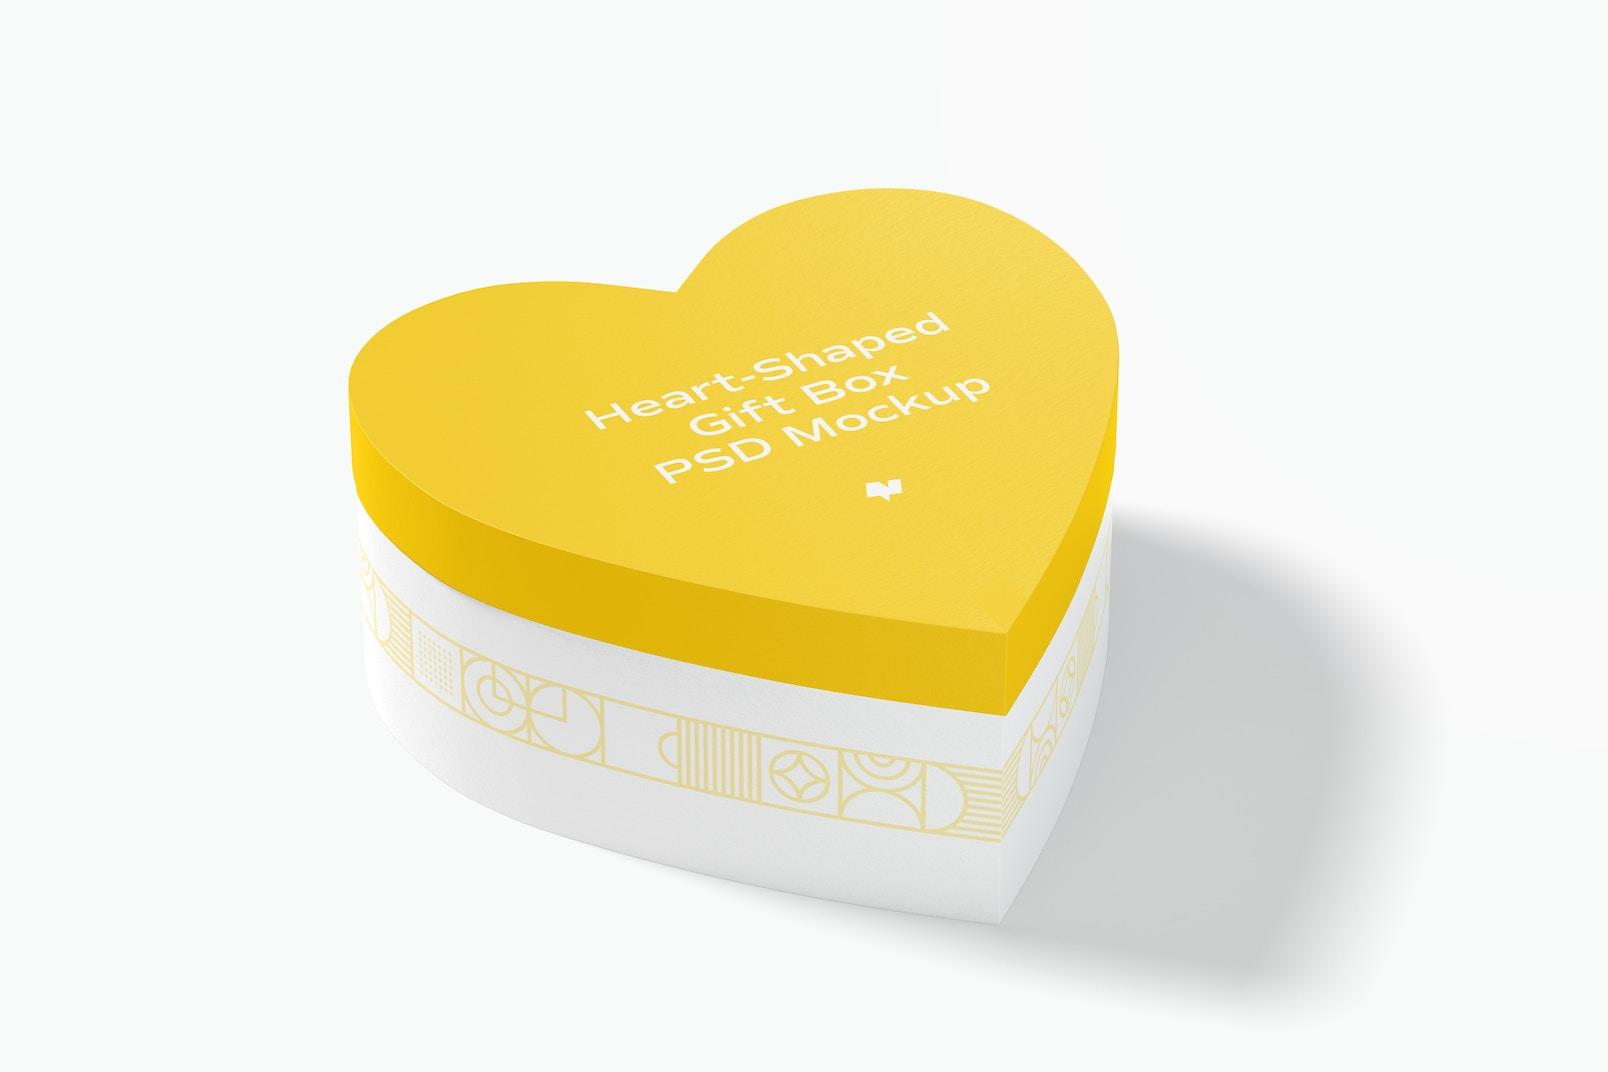 Heart-Shaped Gift Box Mockup